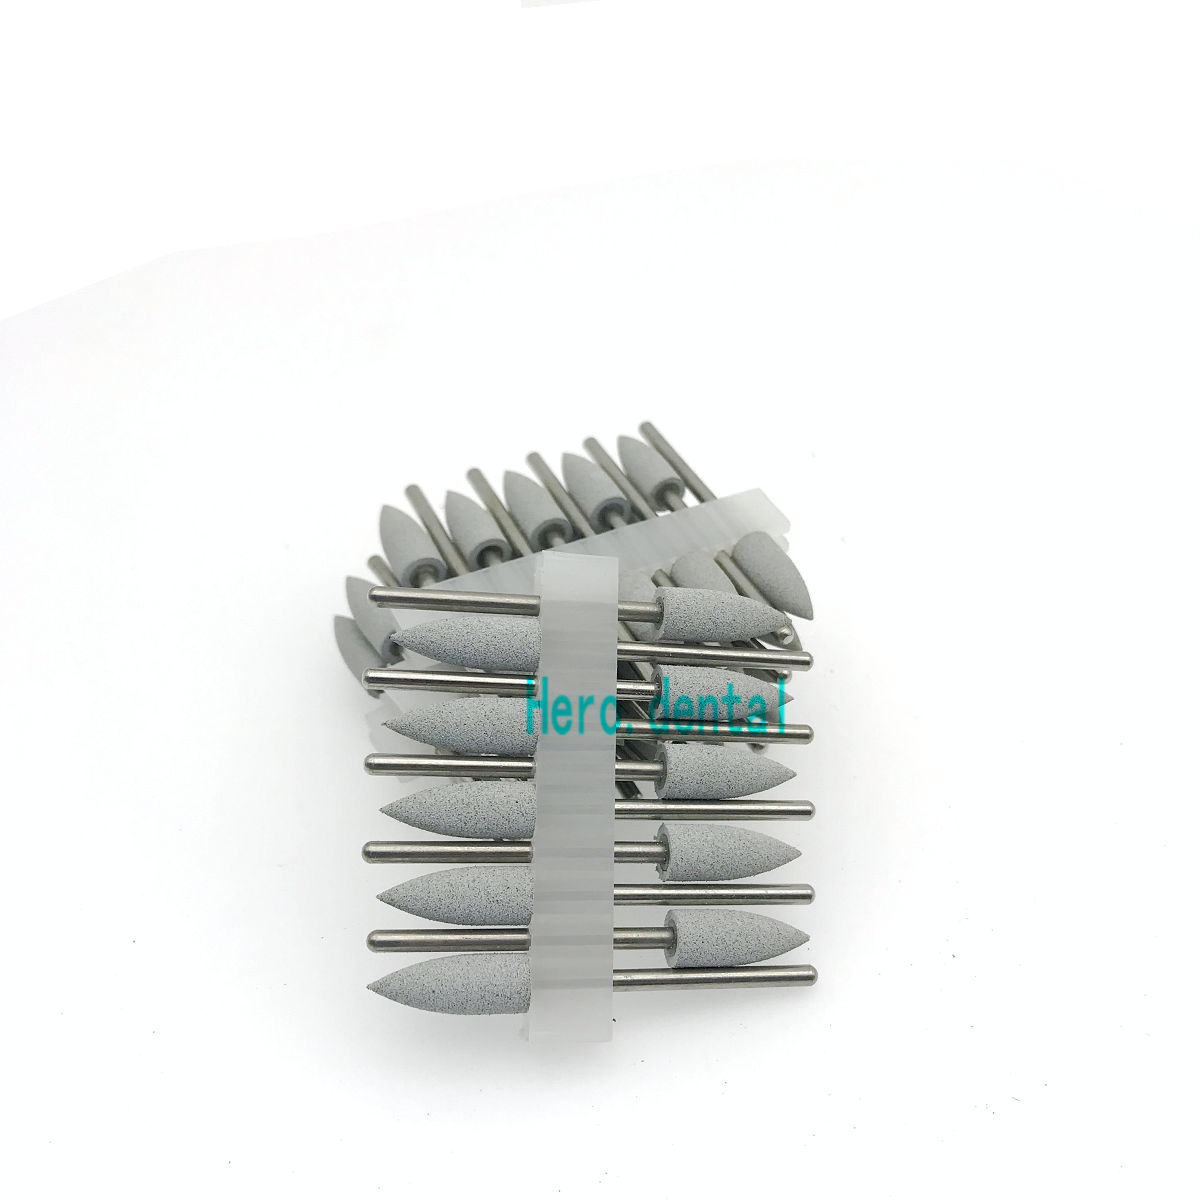 Type 406 Dental Silicone Rubber Resin Base Hidden Denture Polishing Burs Model Grey